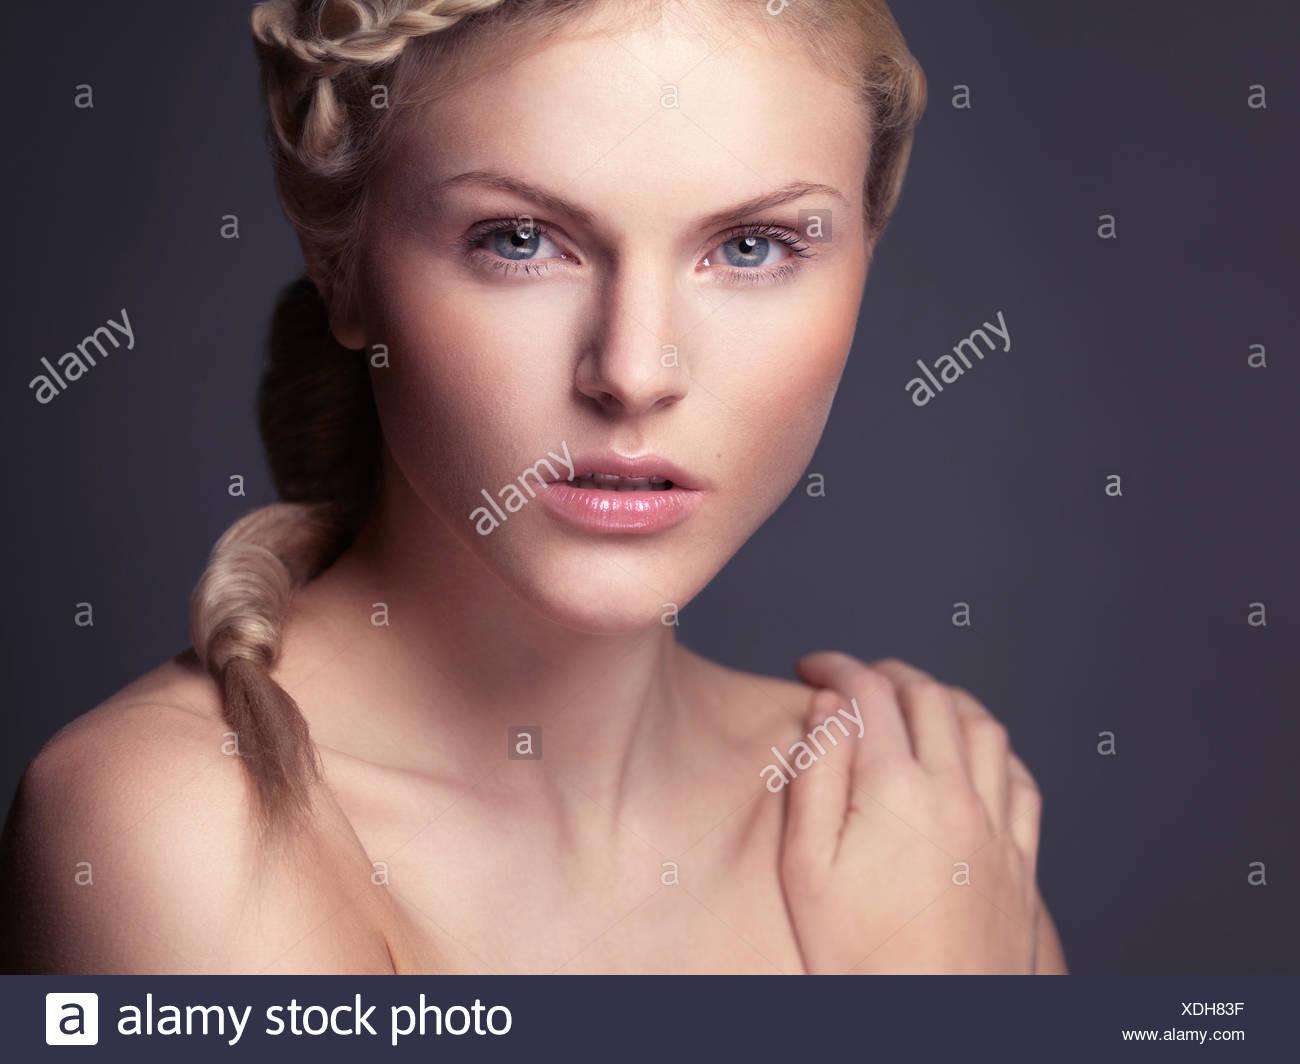 Woman with a braid wearing minimal natural makeup - Stock Image